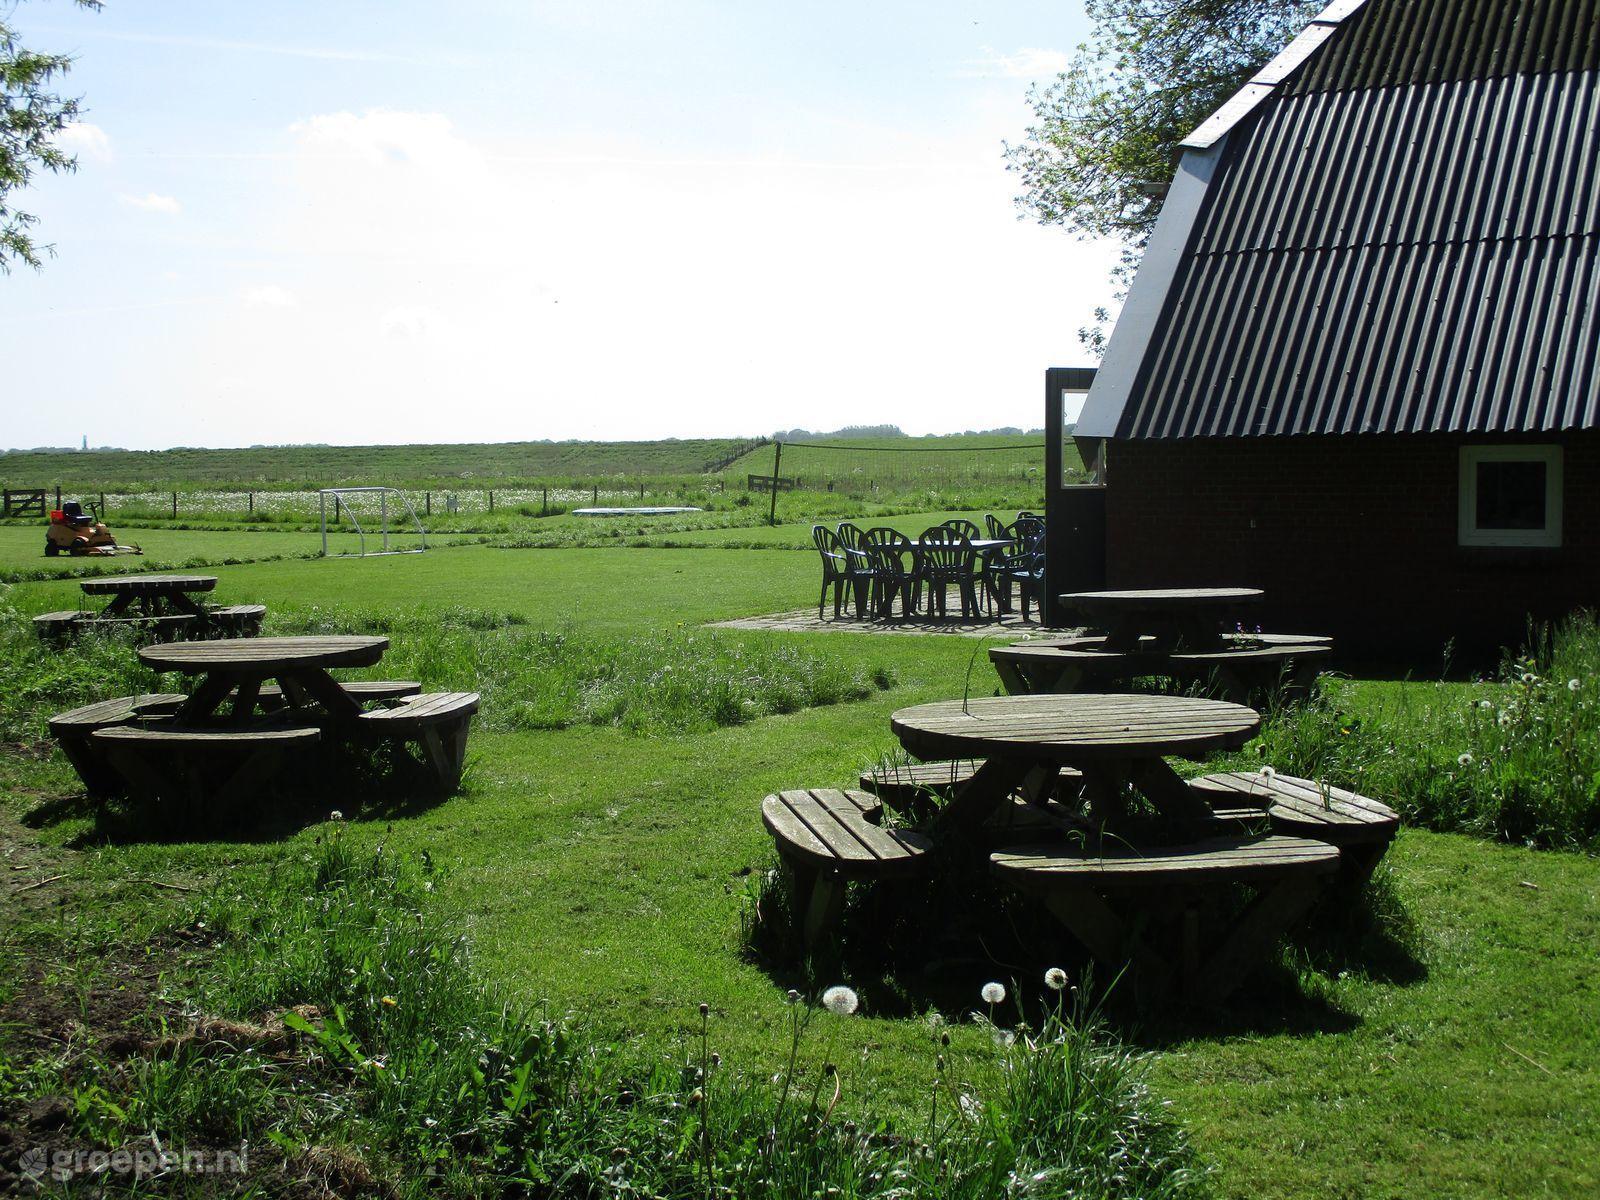 Bauernhäus Noordpolderzijl